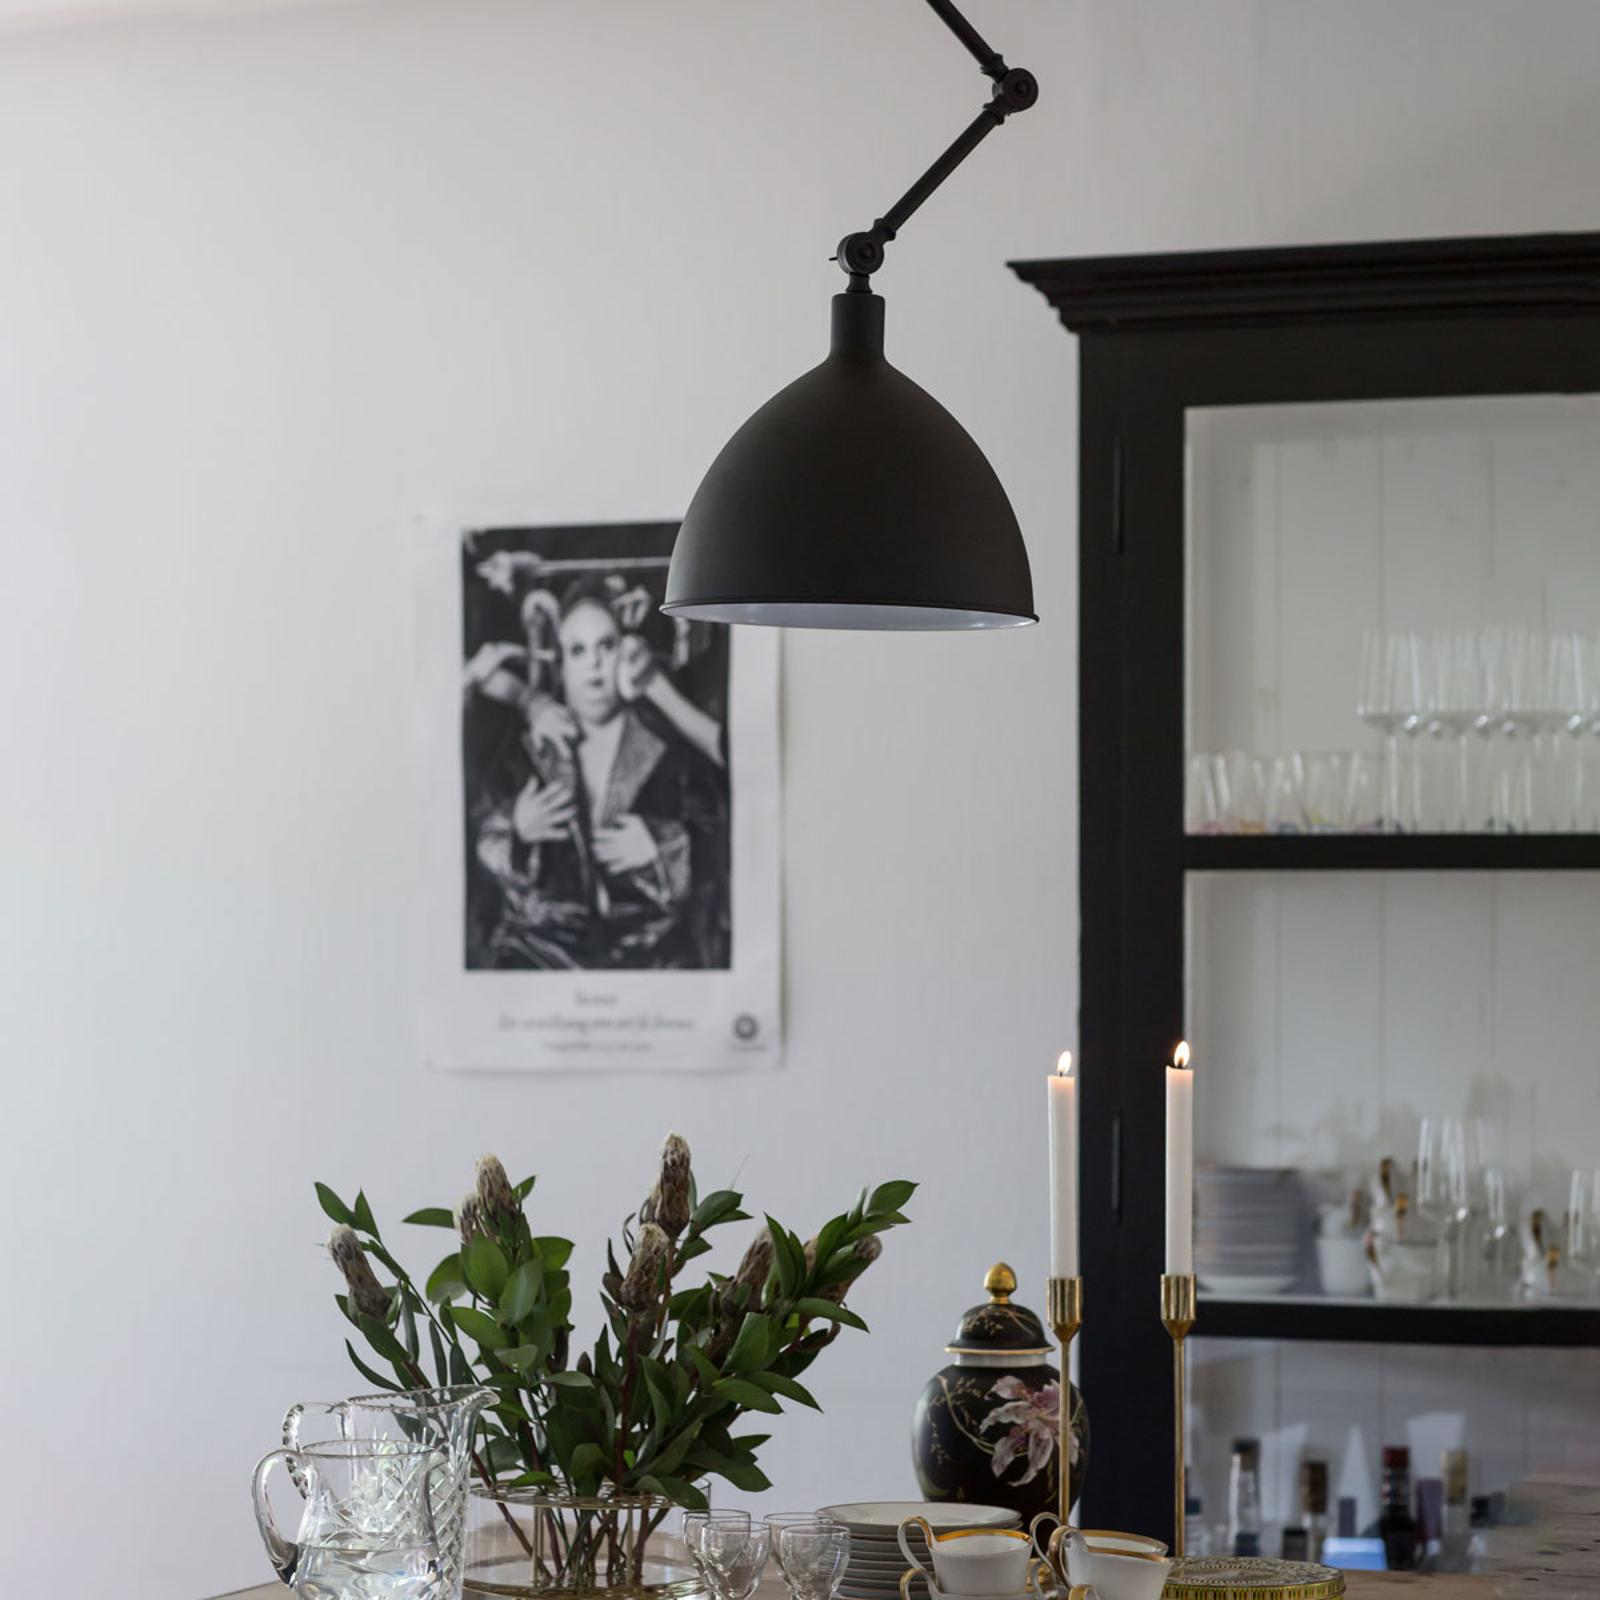 By Rydéns Bazar hanglamp zandzwart